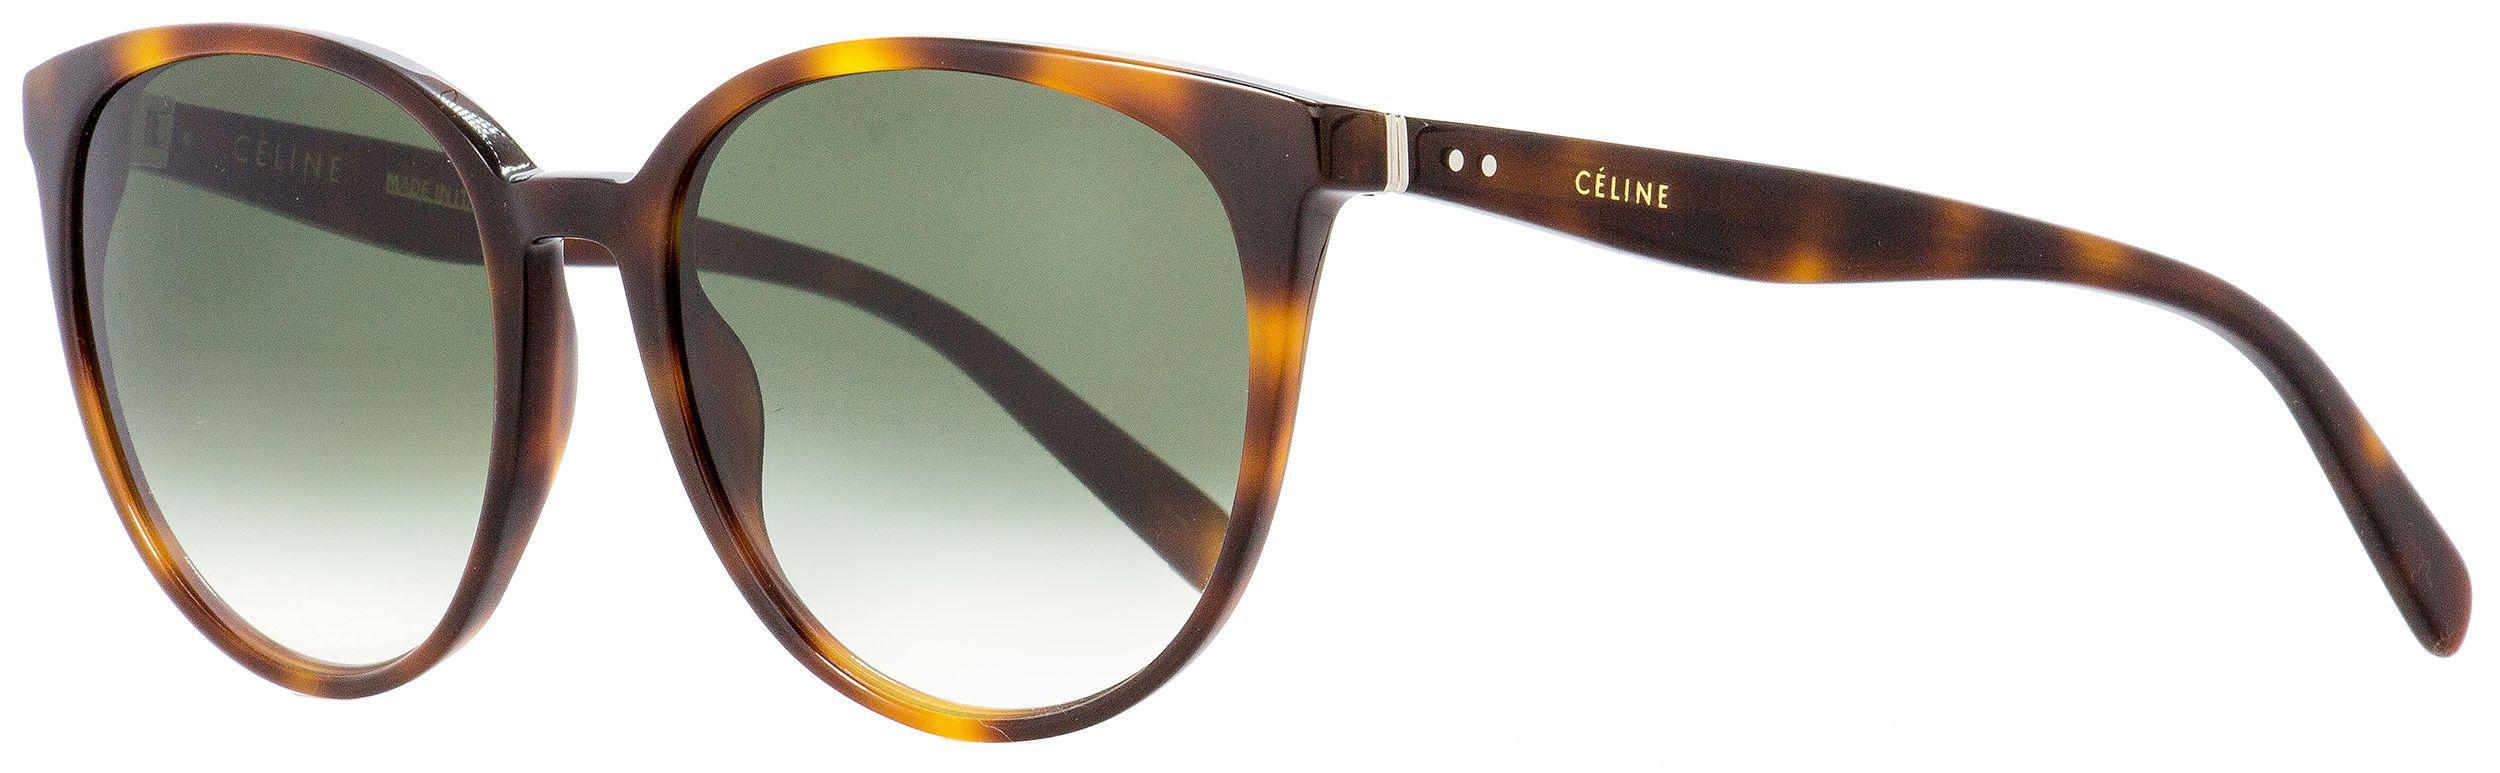 143228c7e6af Céline - Multicolor Oval Sunglasses Cl41068s 05lxm Havana 55mm 41068 -  Lyst. View fullscreen